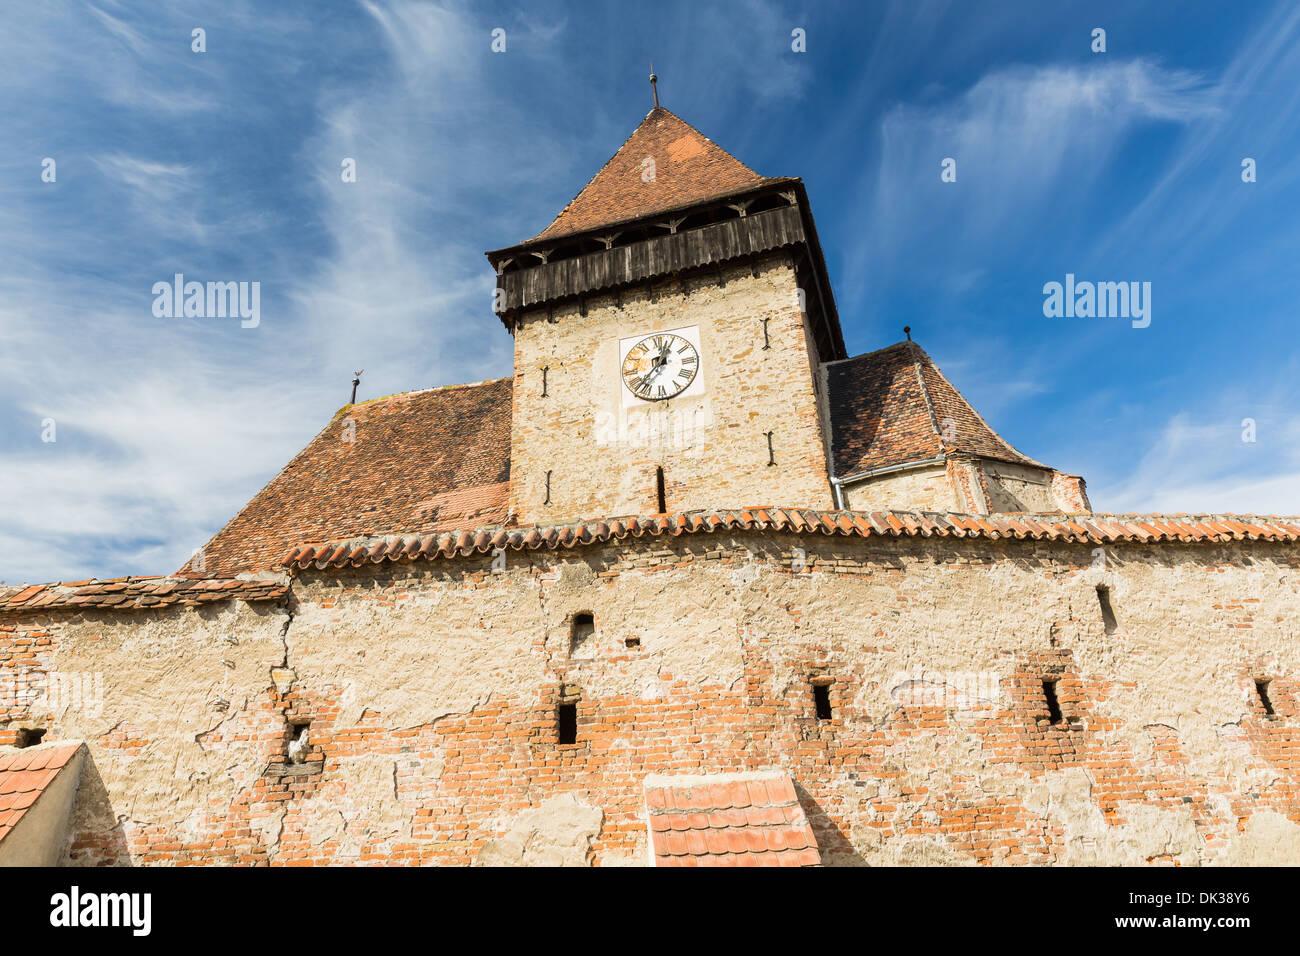 Fortified church of Axente Sever, Transylvania Romania - Stock Image